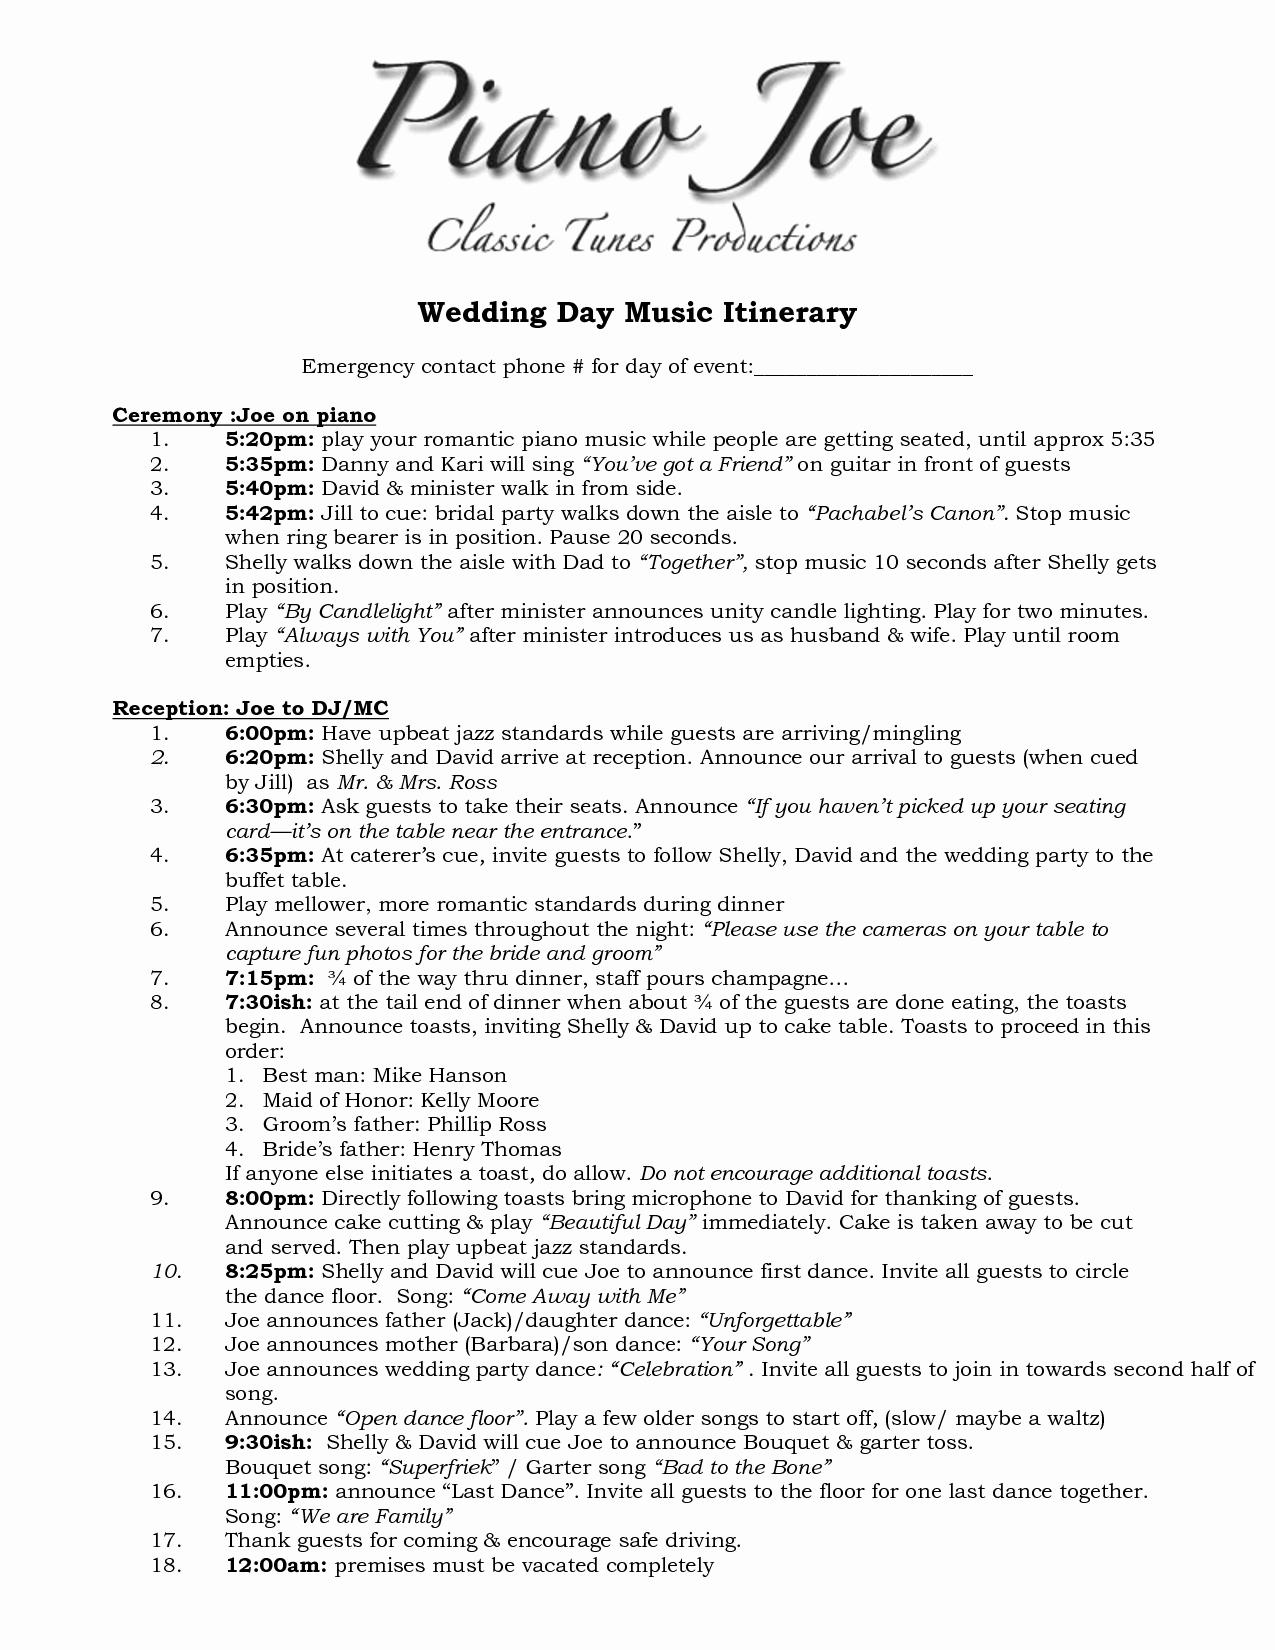 Free Wedding Itinerary Template Luxury Wedding Itinerary Templates Free 1275px